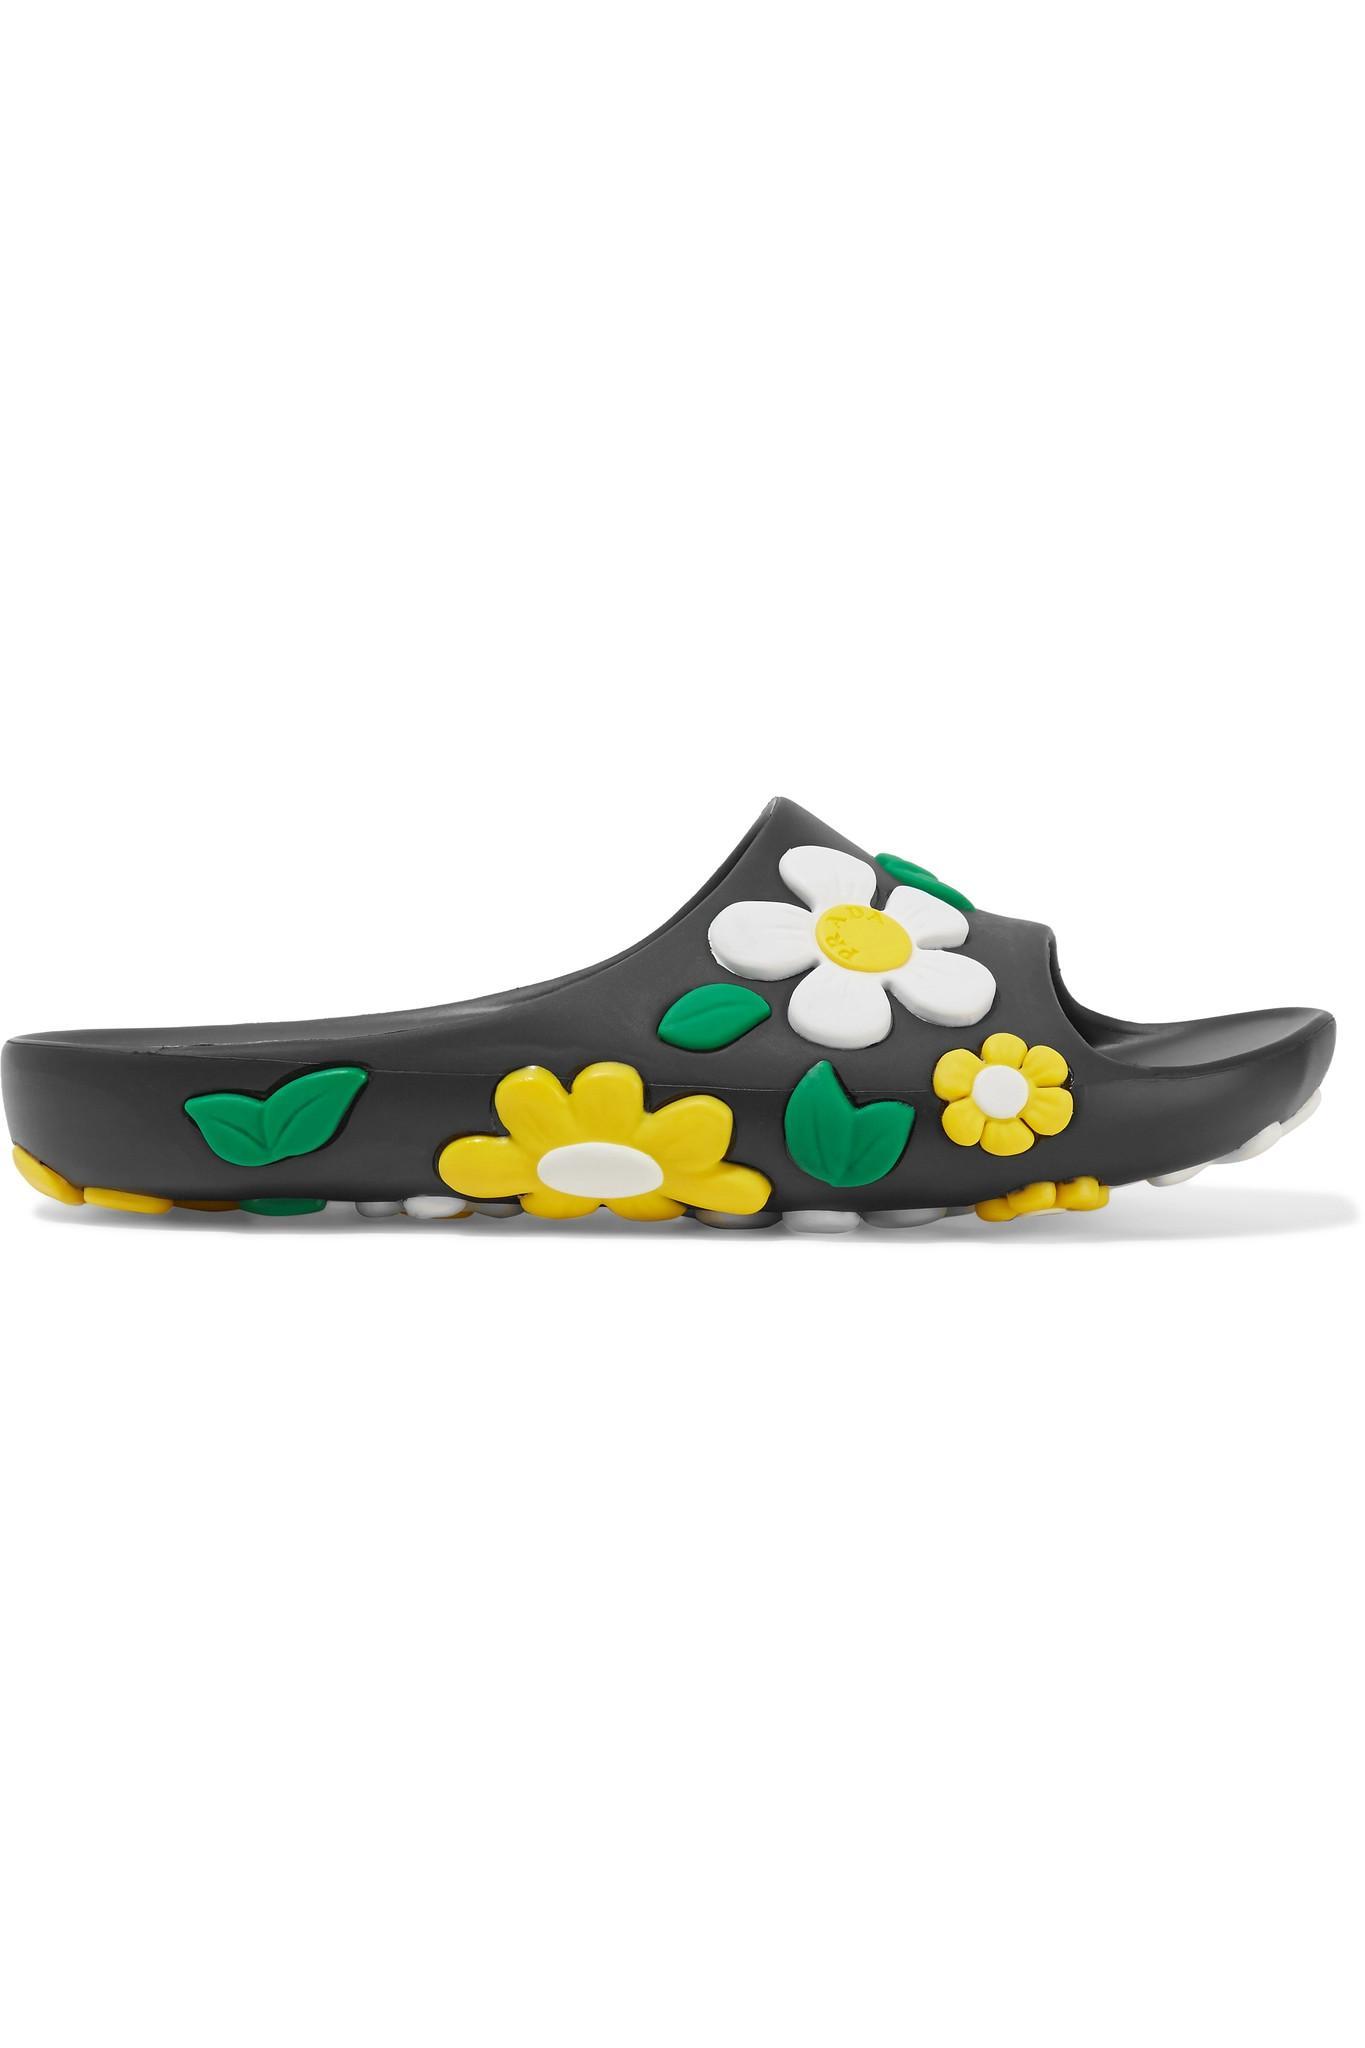 f4b8e0e592cf Prada Floral Slide Sandal - Ontario Active School Travel